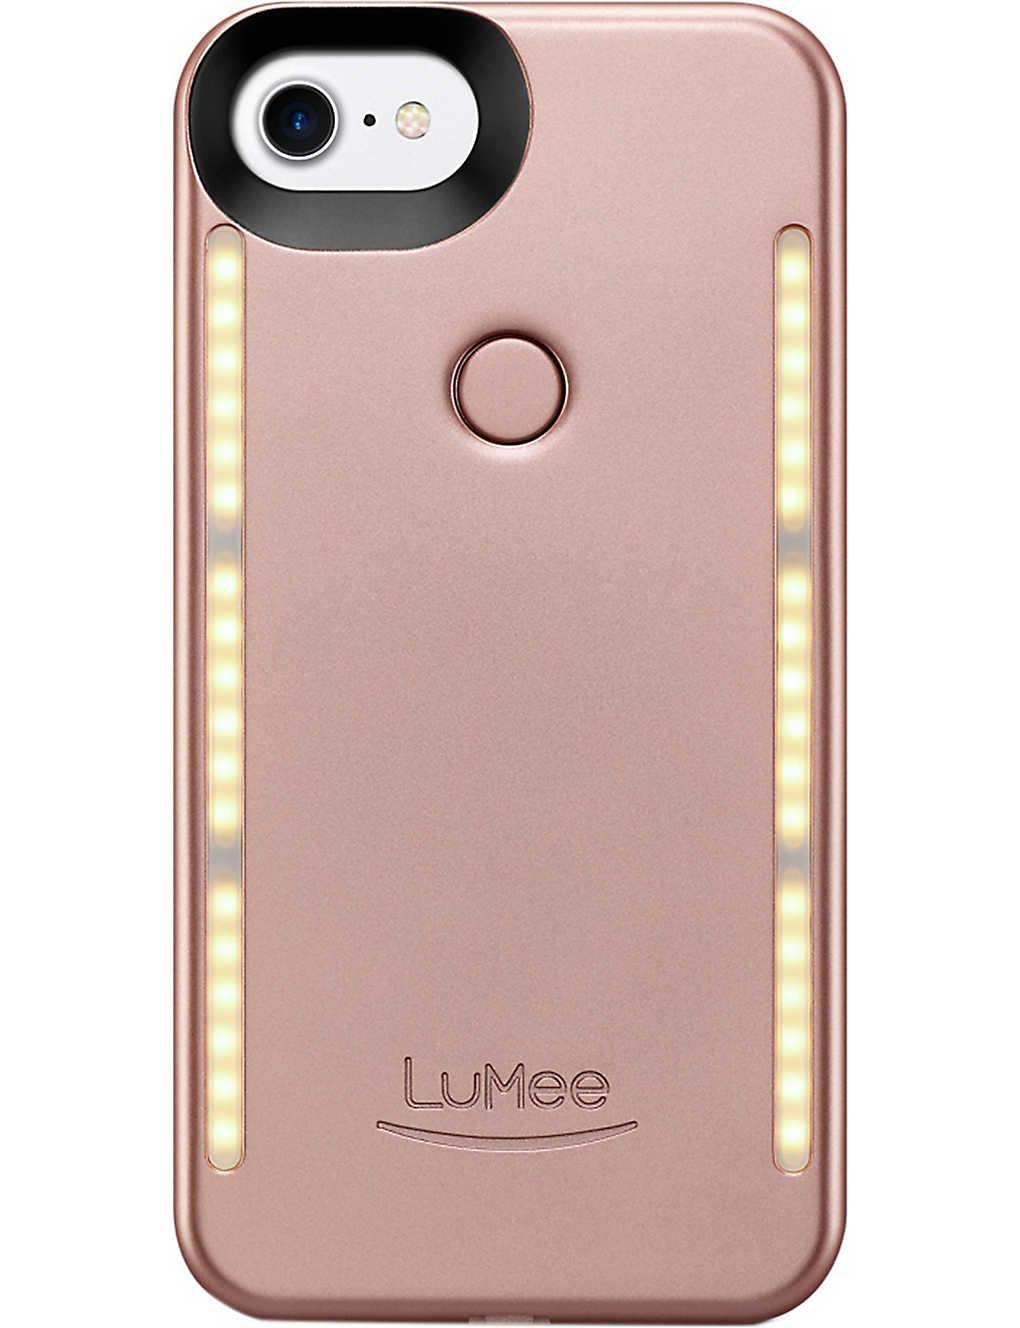 premium selection 1a959 6c731 LUMEE - Lumee Duo Selfie iPhone 7 Phone Case | Selfridges.com